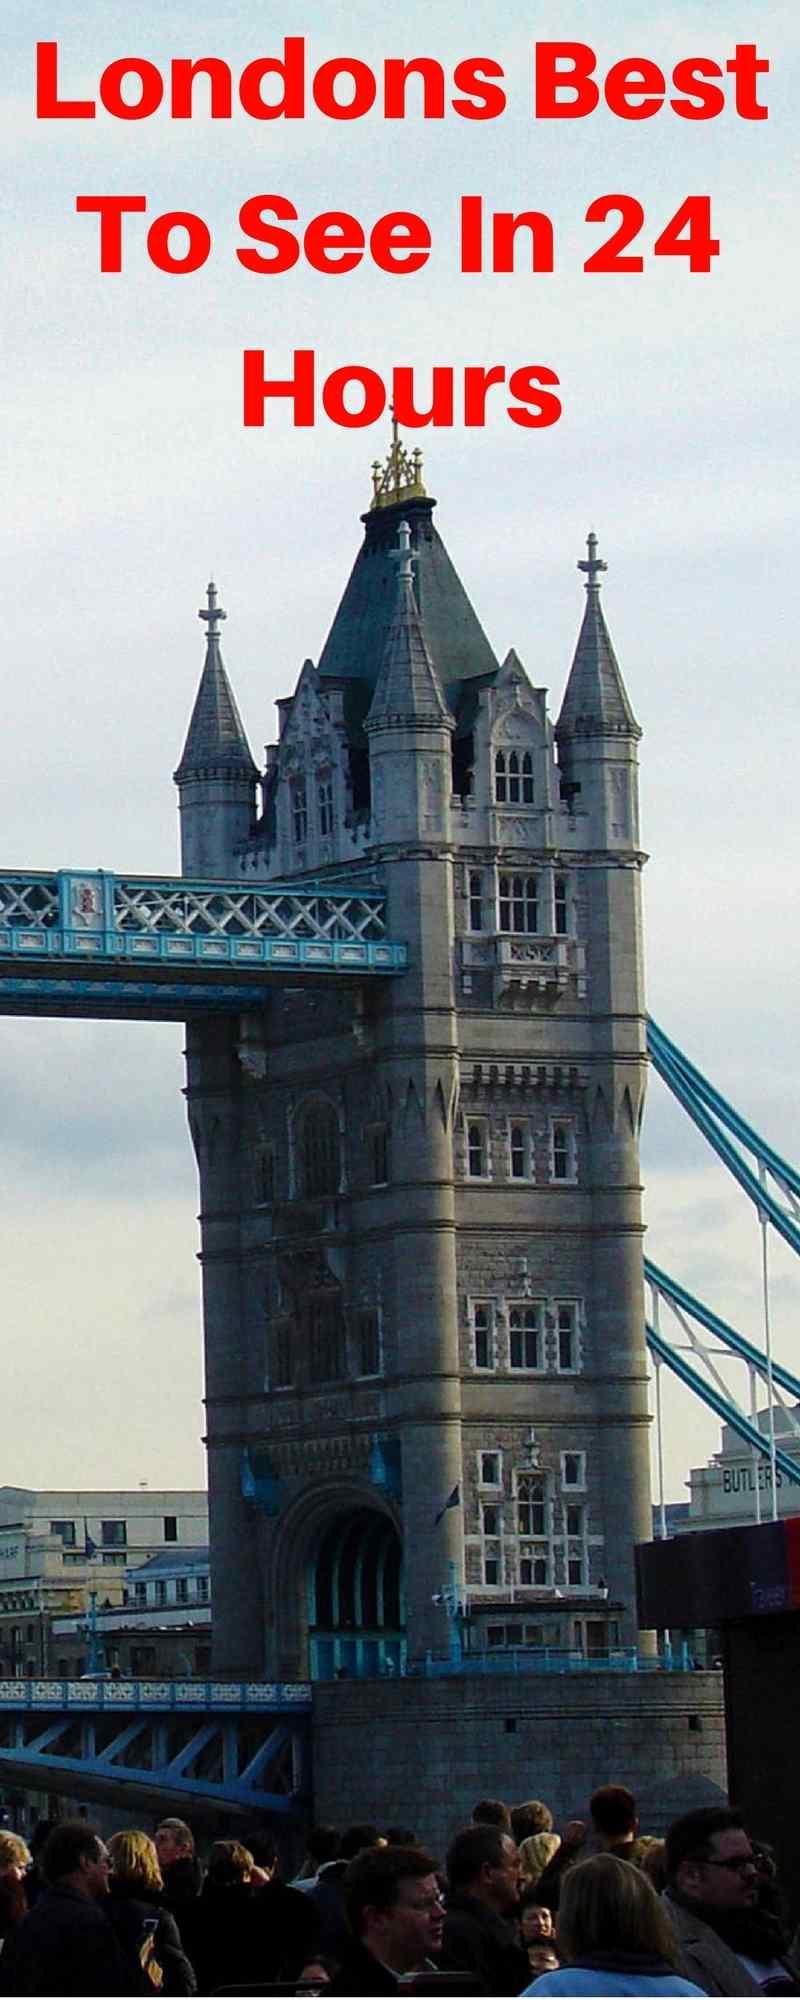 London: Her Best to See in 24 Hours | Tower of London | British Museum | Western Europe | Western Europe Ancestry | Western Europe Map | Western Europe Food | Western Europe Itinerary | Europe Travel | Europe Fashion | Travel | ARoadtoTravel.com